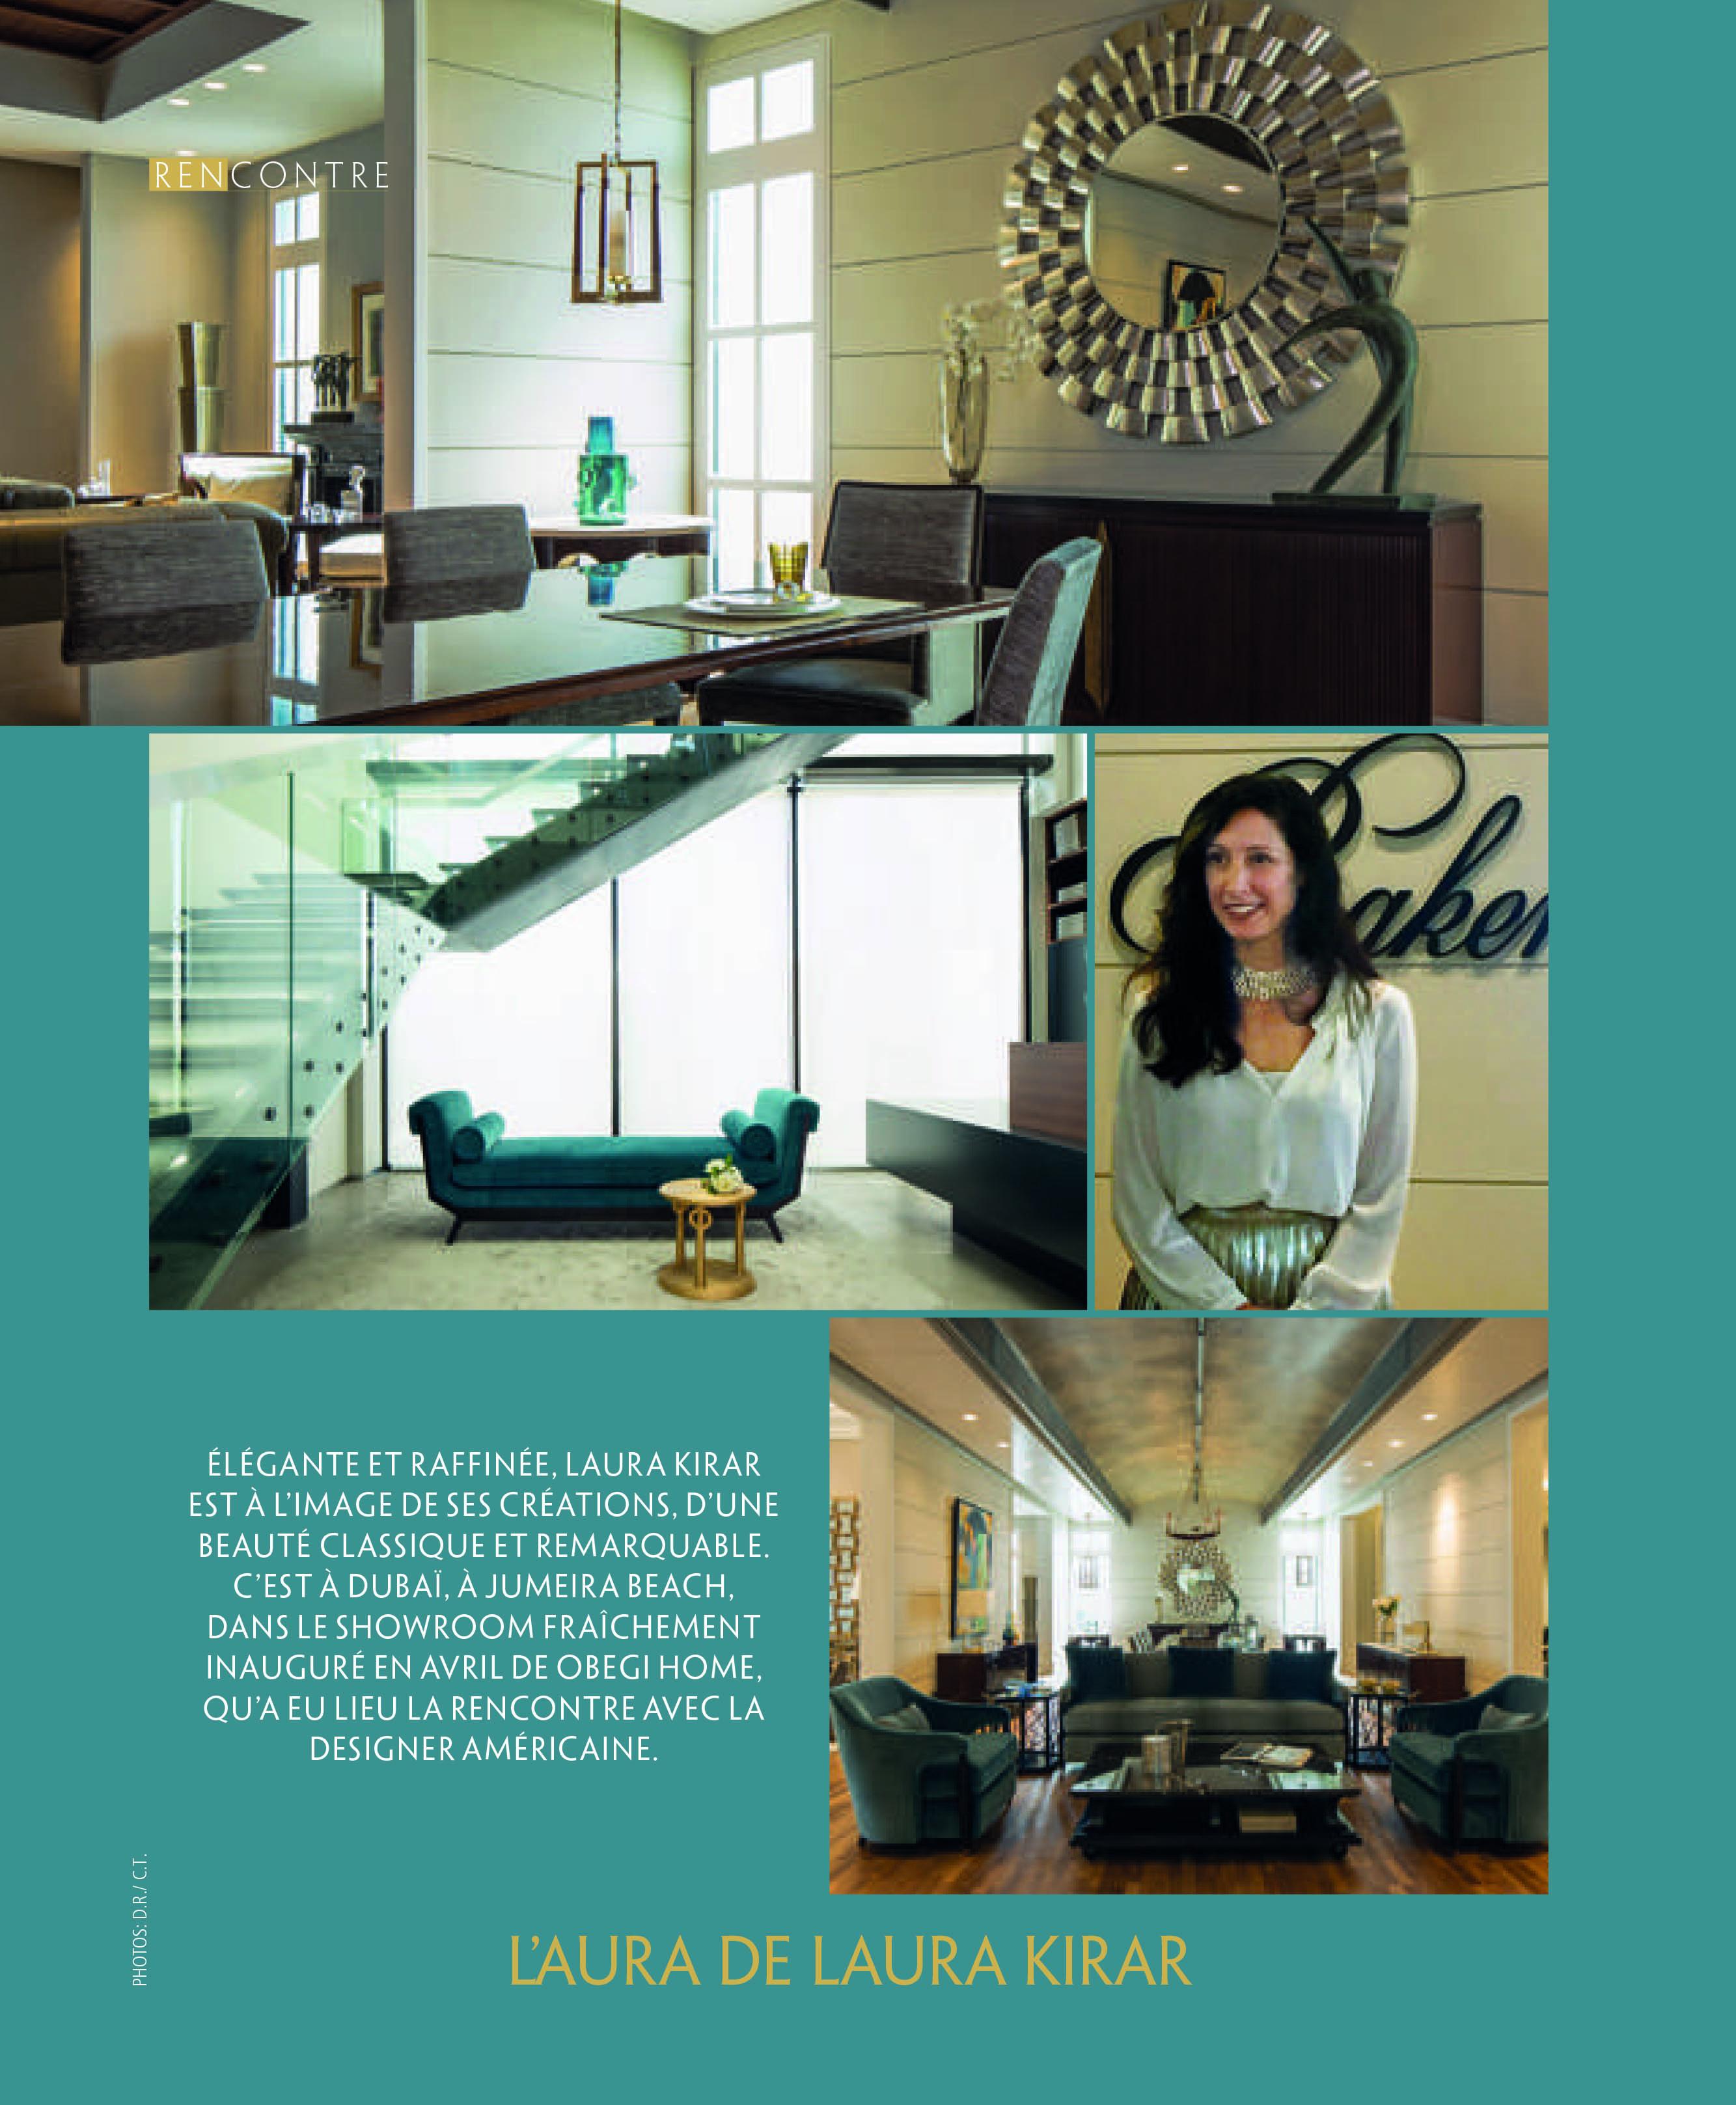 laura kirar, baker furniture, product design, interior design, middle east, lebanon, deco magazine, architecture